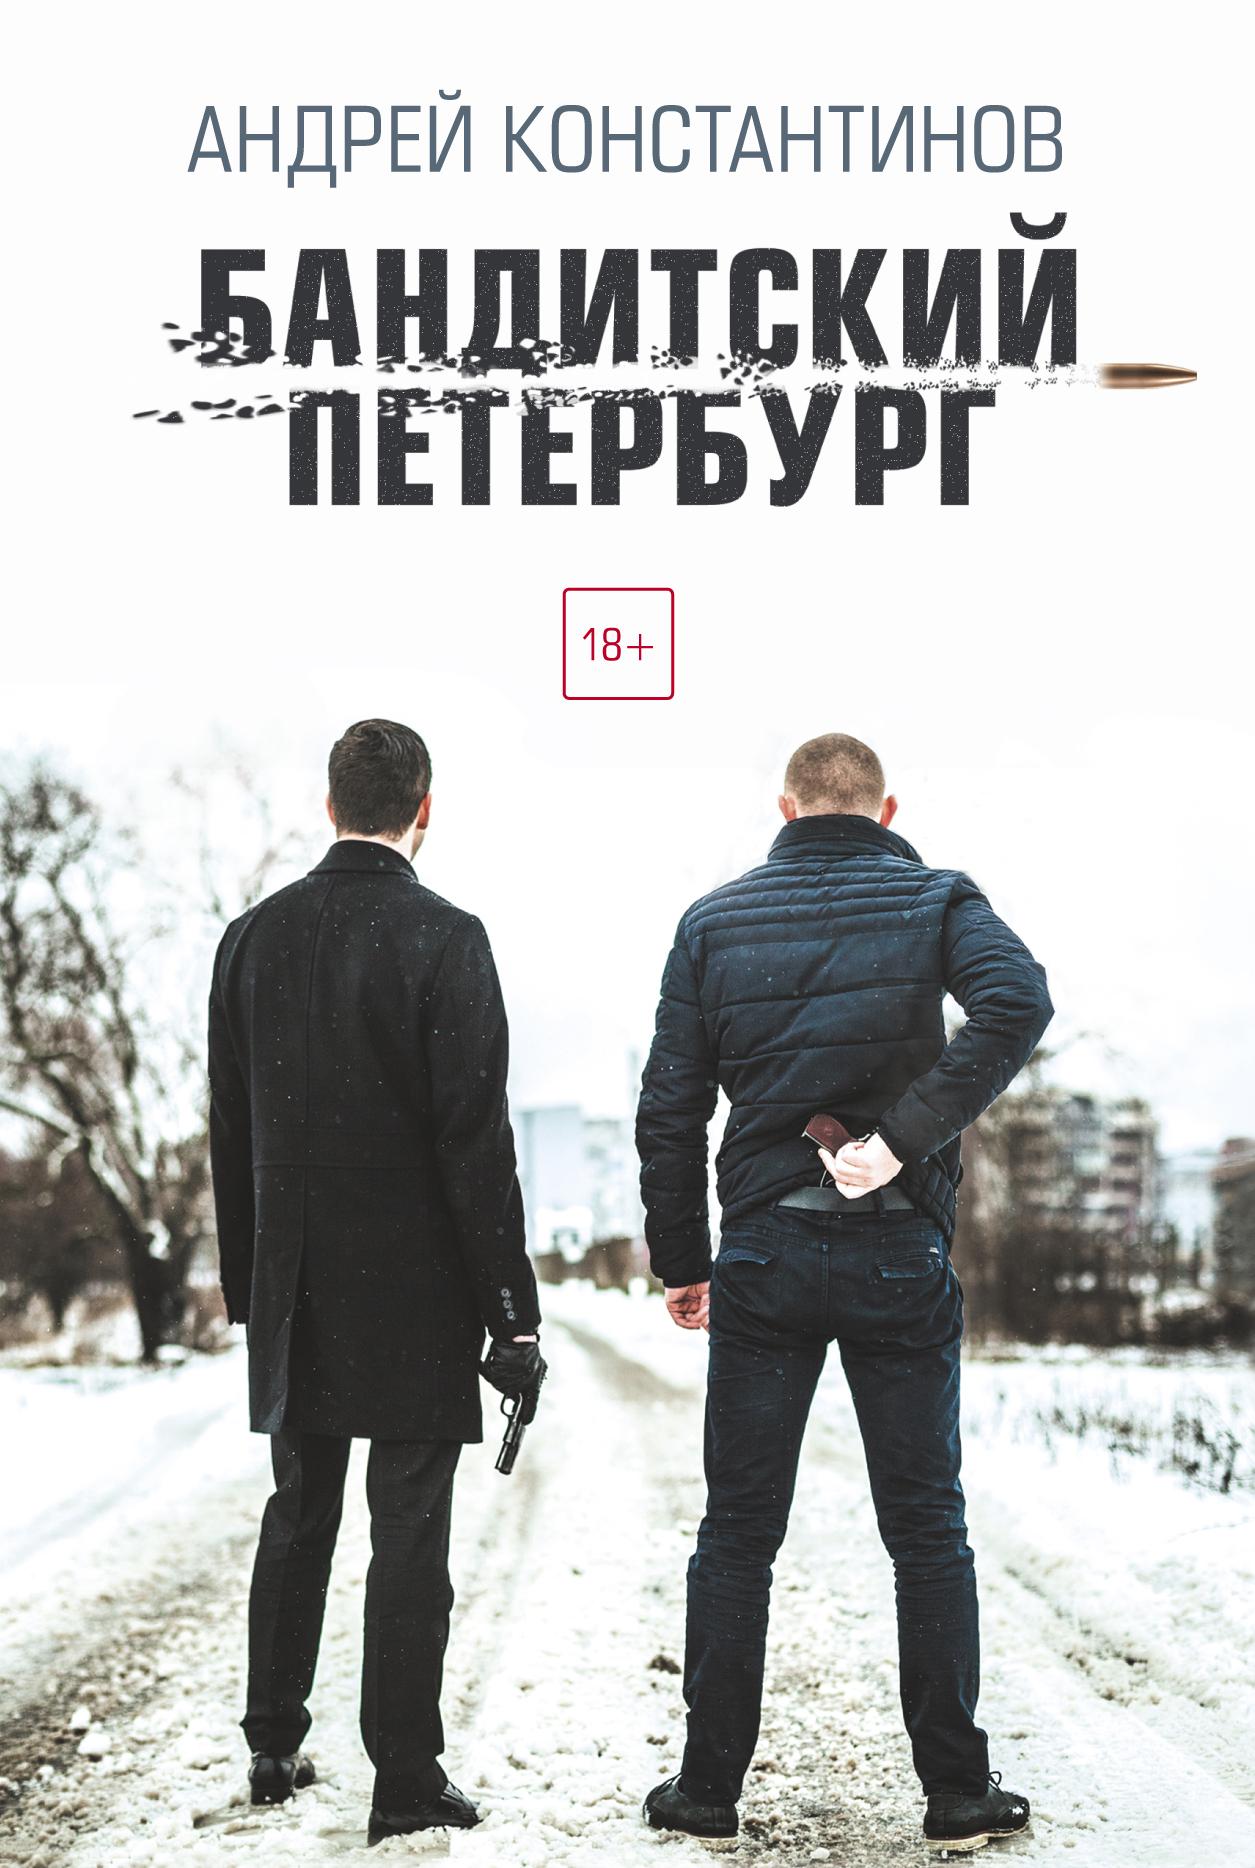 Константинов Андрей Бандитский Петербург